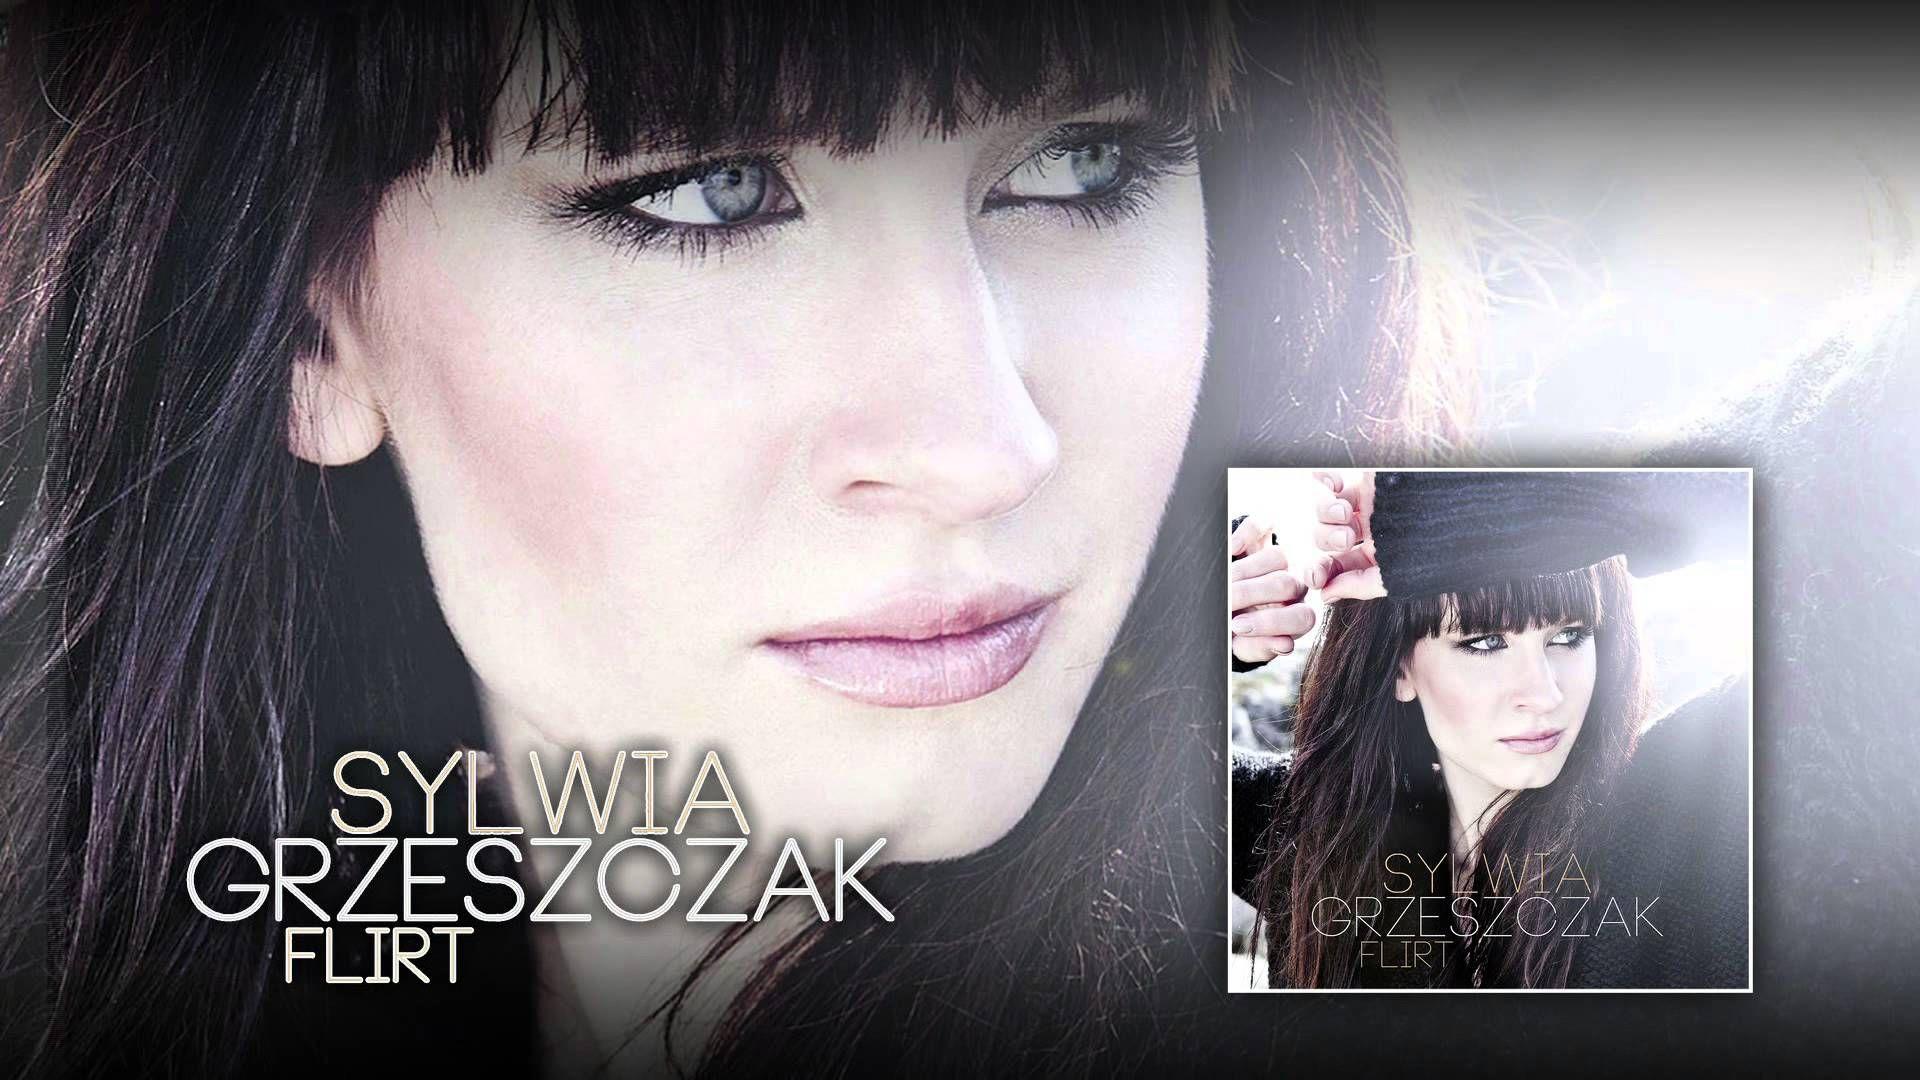 Sylwia Grzeszczak Flirt Official Audio Flirting Music Videos Movie Posters